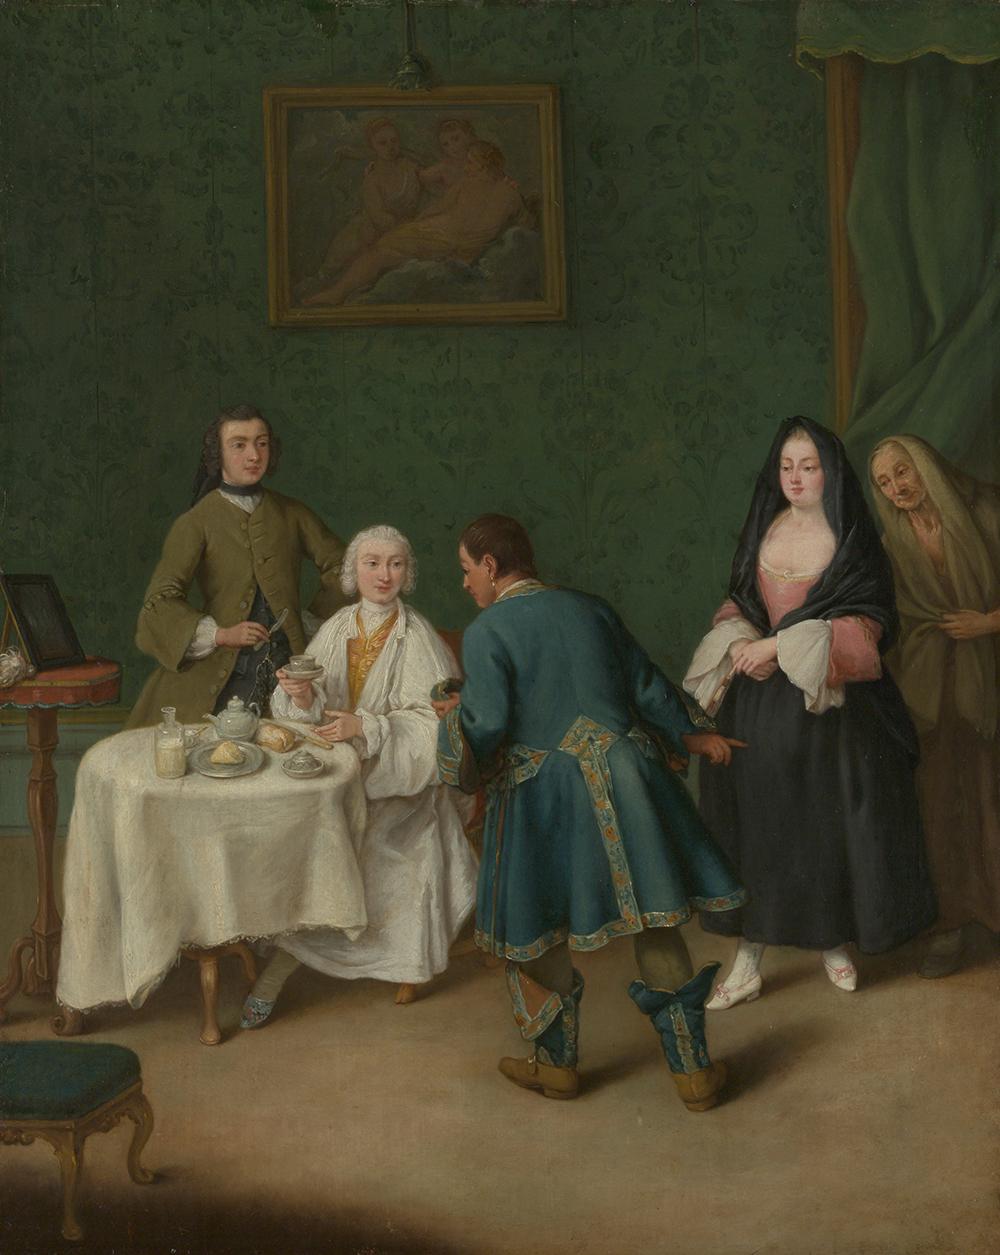 The Temptation, by Pietro Longhi, 1746. The Metropolitan Museum of Art, Gift of J. Pierpont Morgan, 1917.